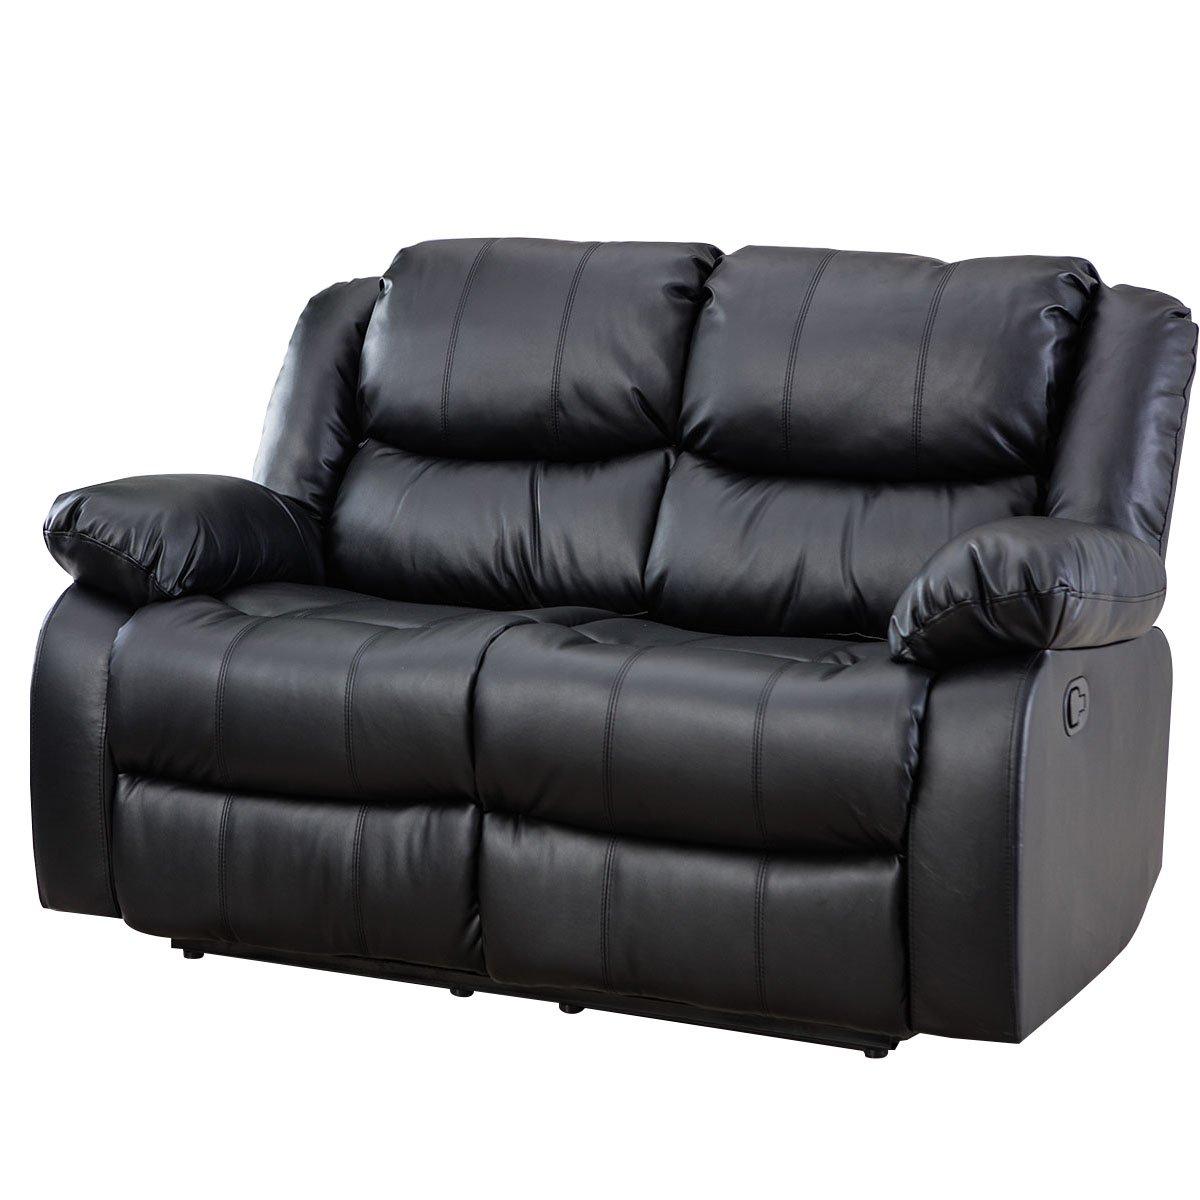 Amazon com giantex 3pc black motion sofa loveseat recliner set living room bonded leather furniture love seat black kitchen dining